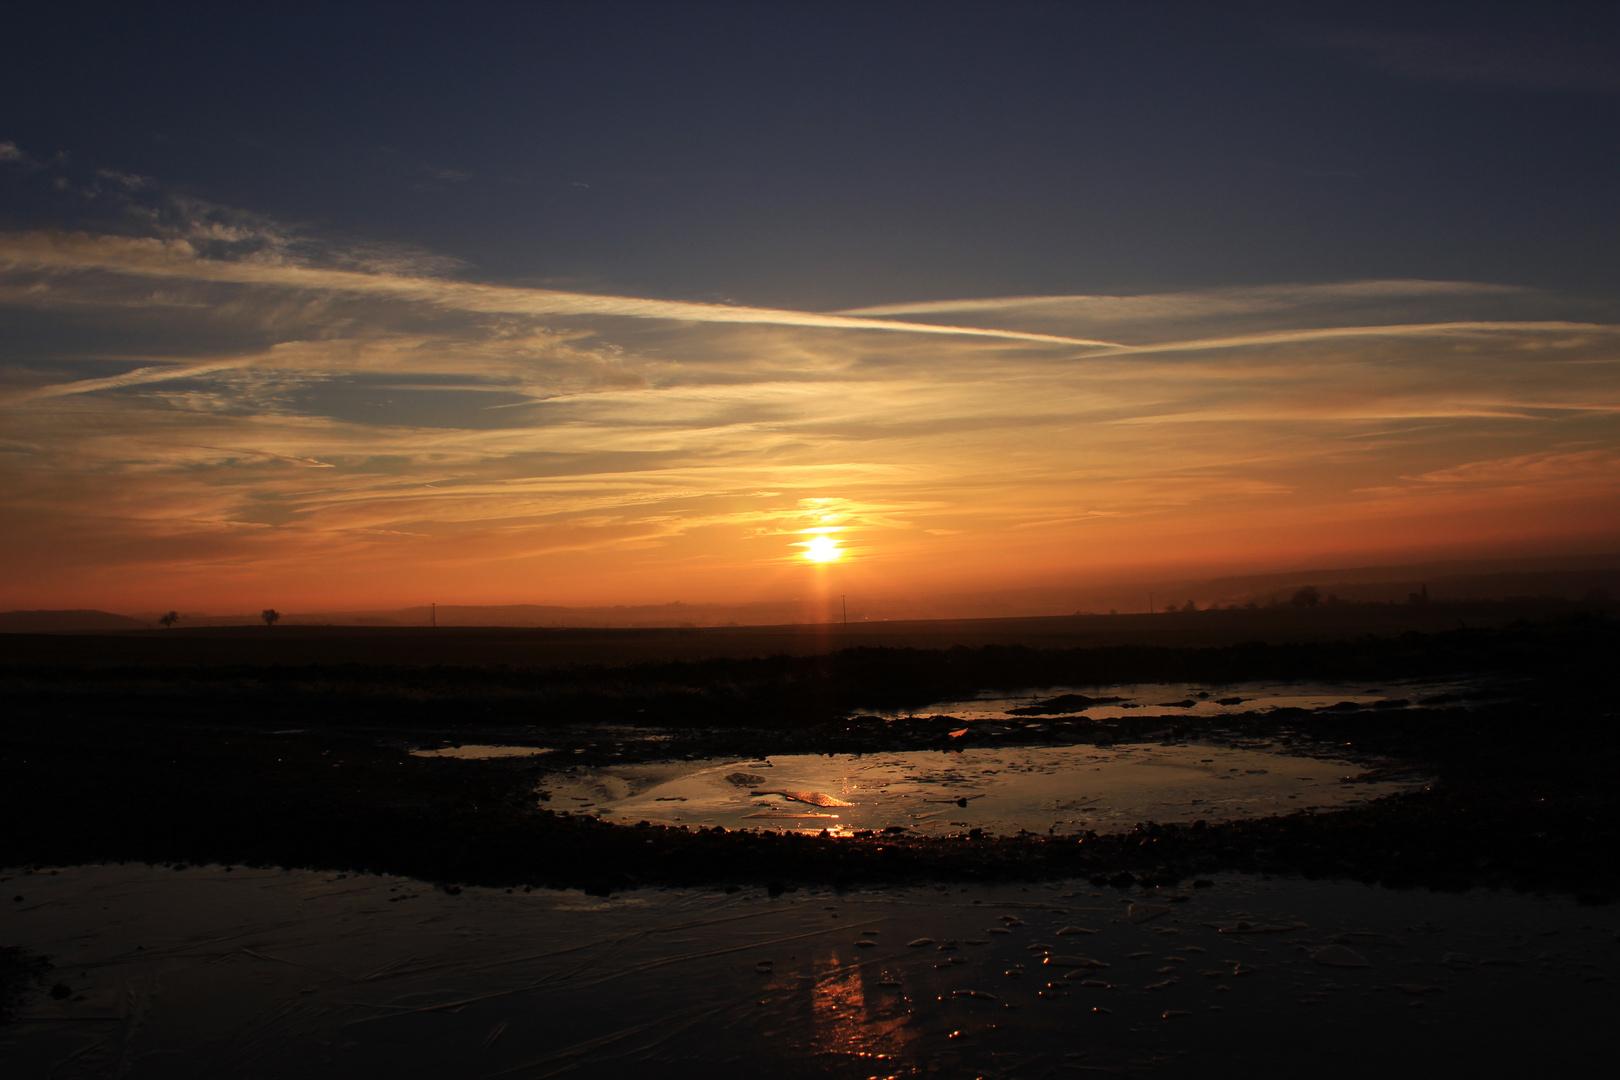 Spaziergang bei Sonnenaufgang